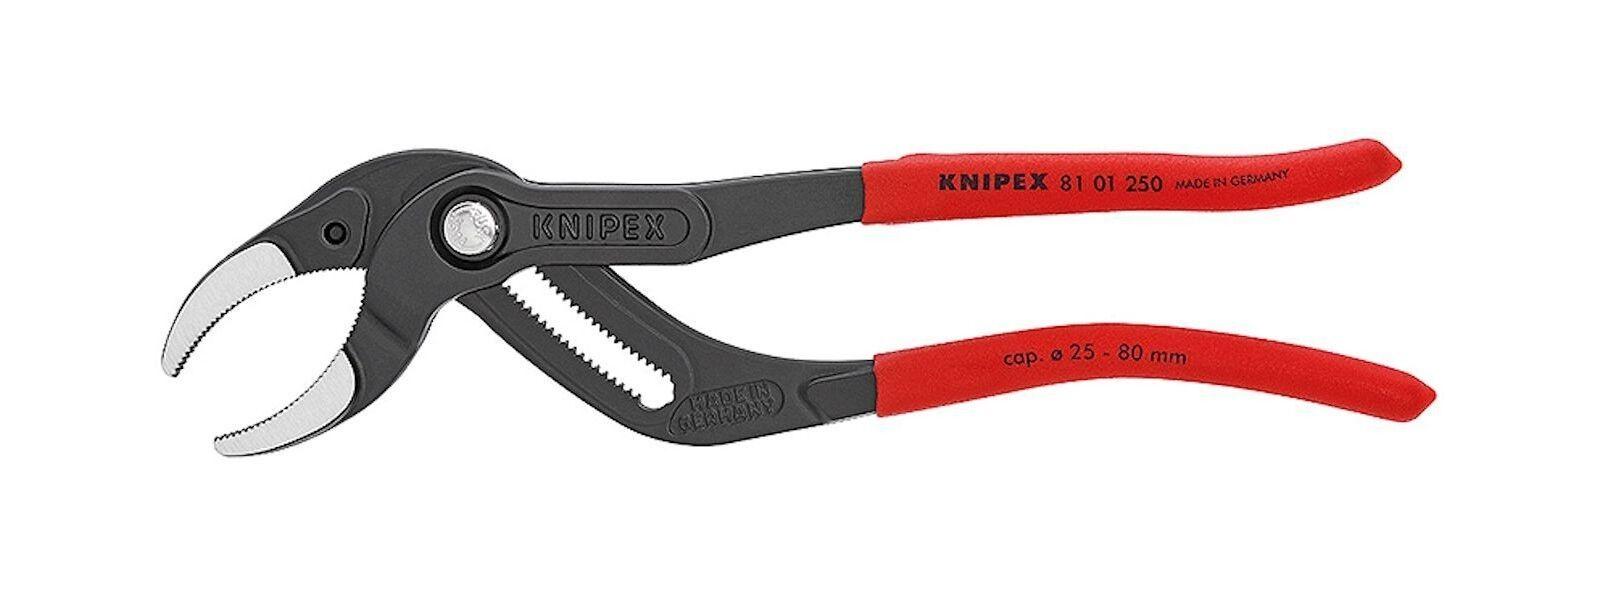 Knipex Sifón Connectorenzange para Siphons Tubos de Plástico Connectore